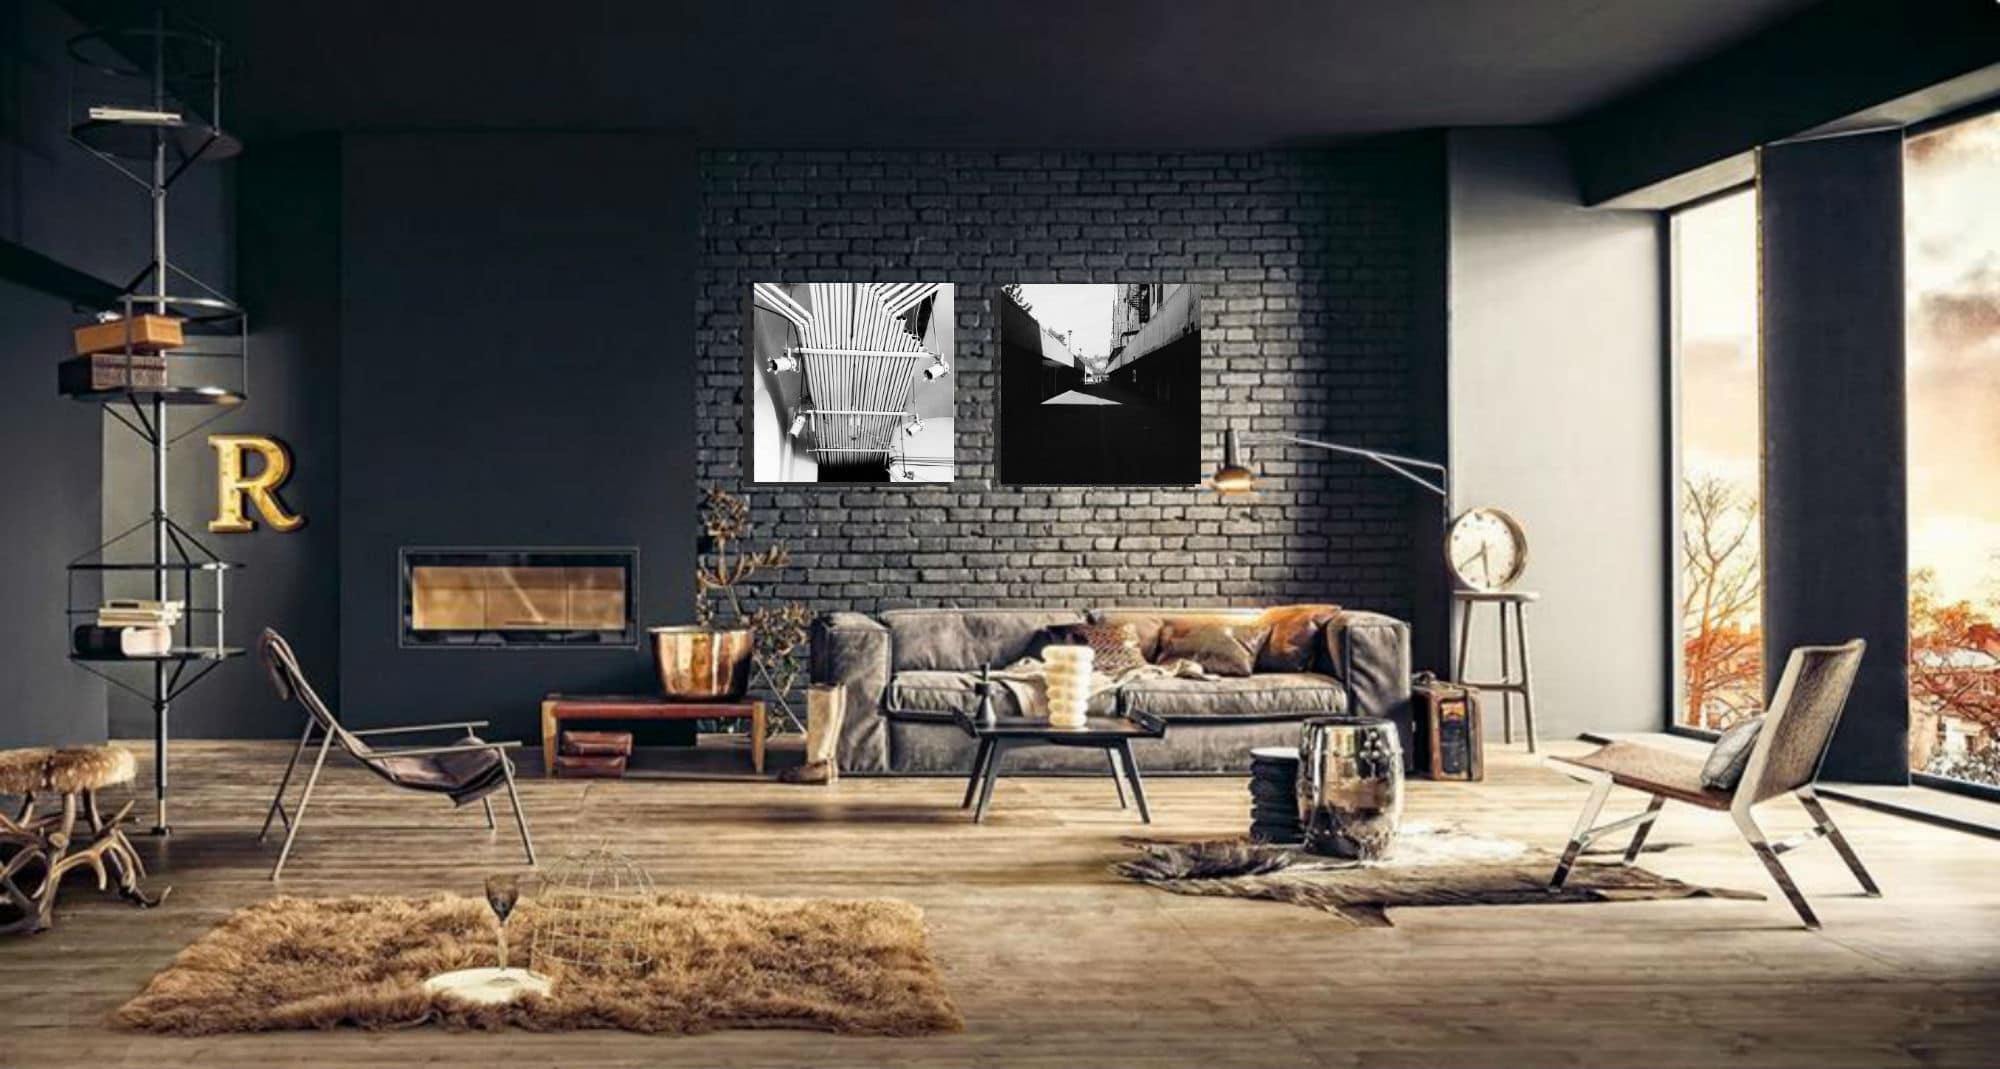 Ipari elegancia – a loft stílus - Bútoraim.hu magazin